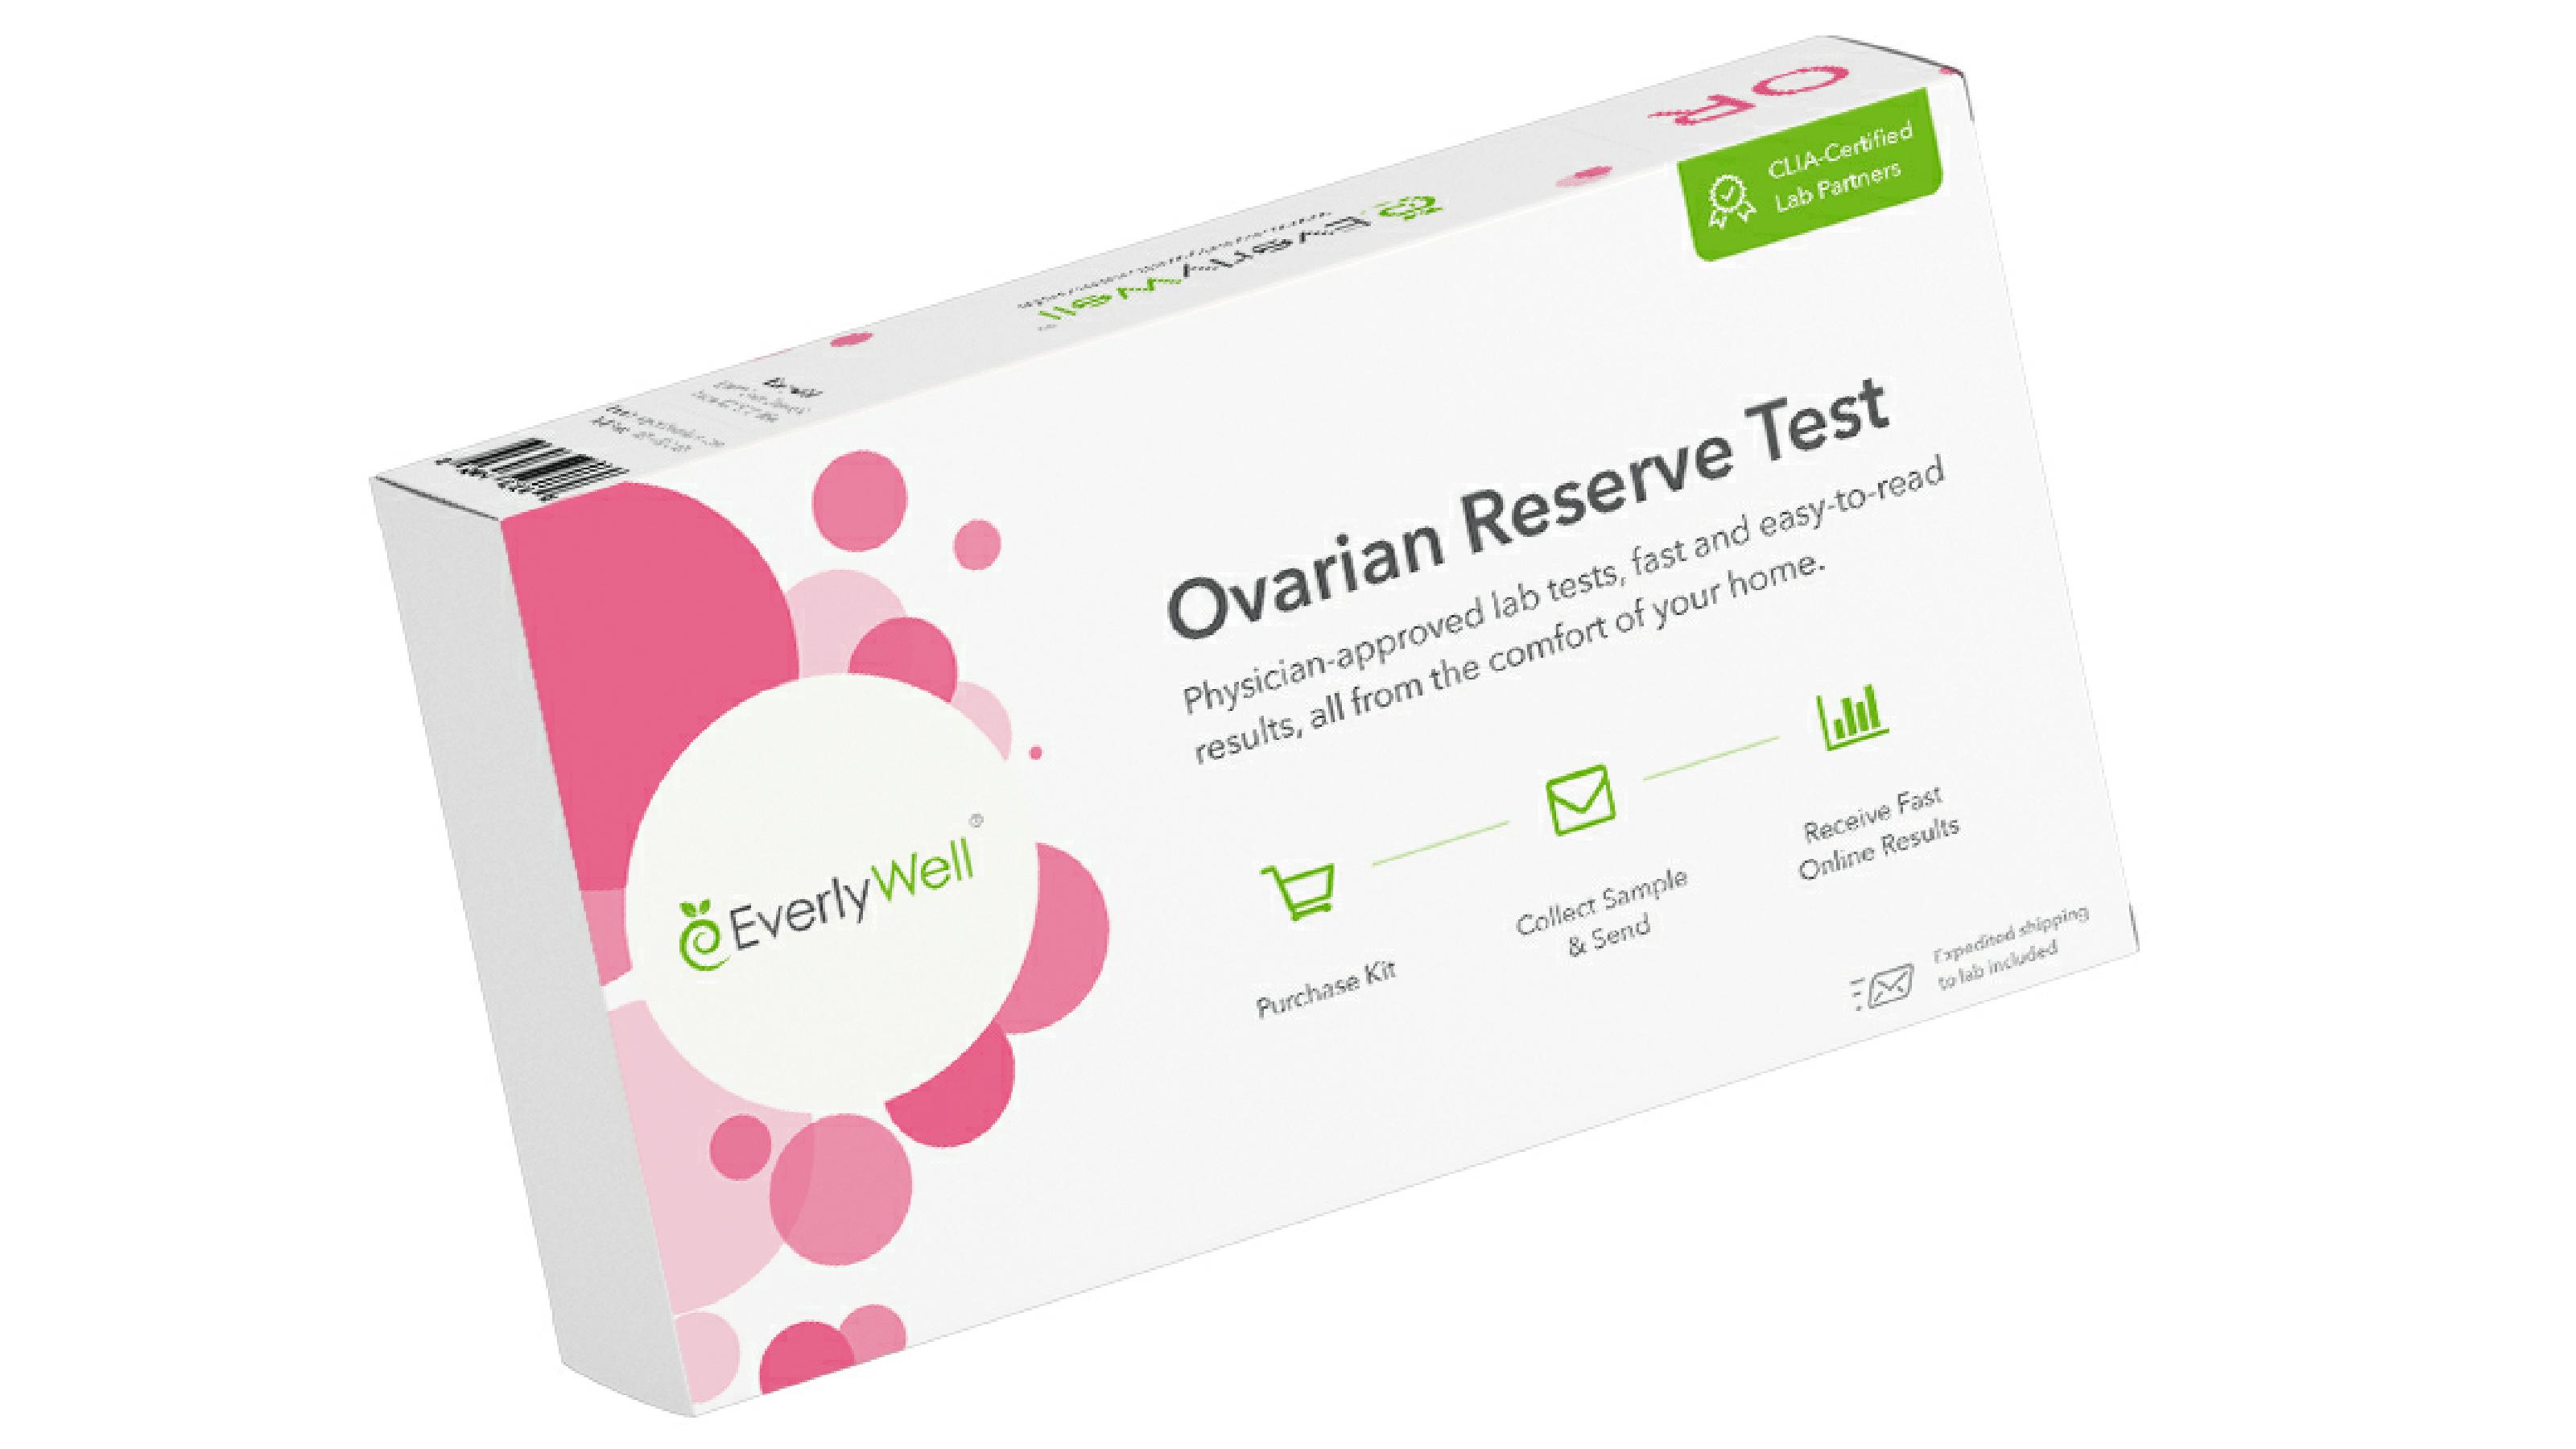 Ovarianreserve9x16second1